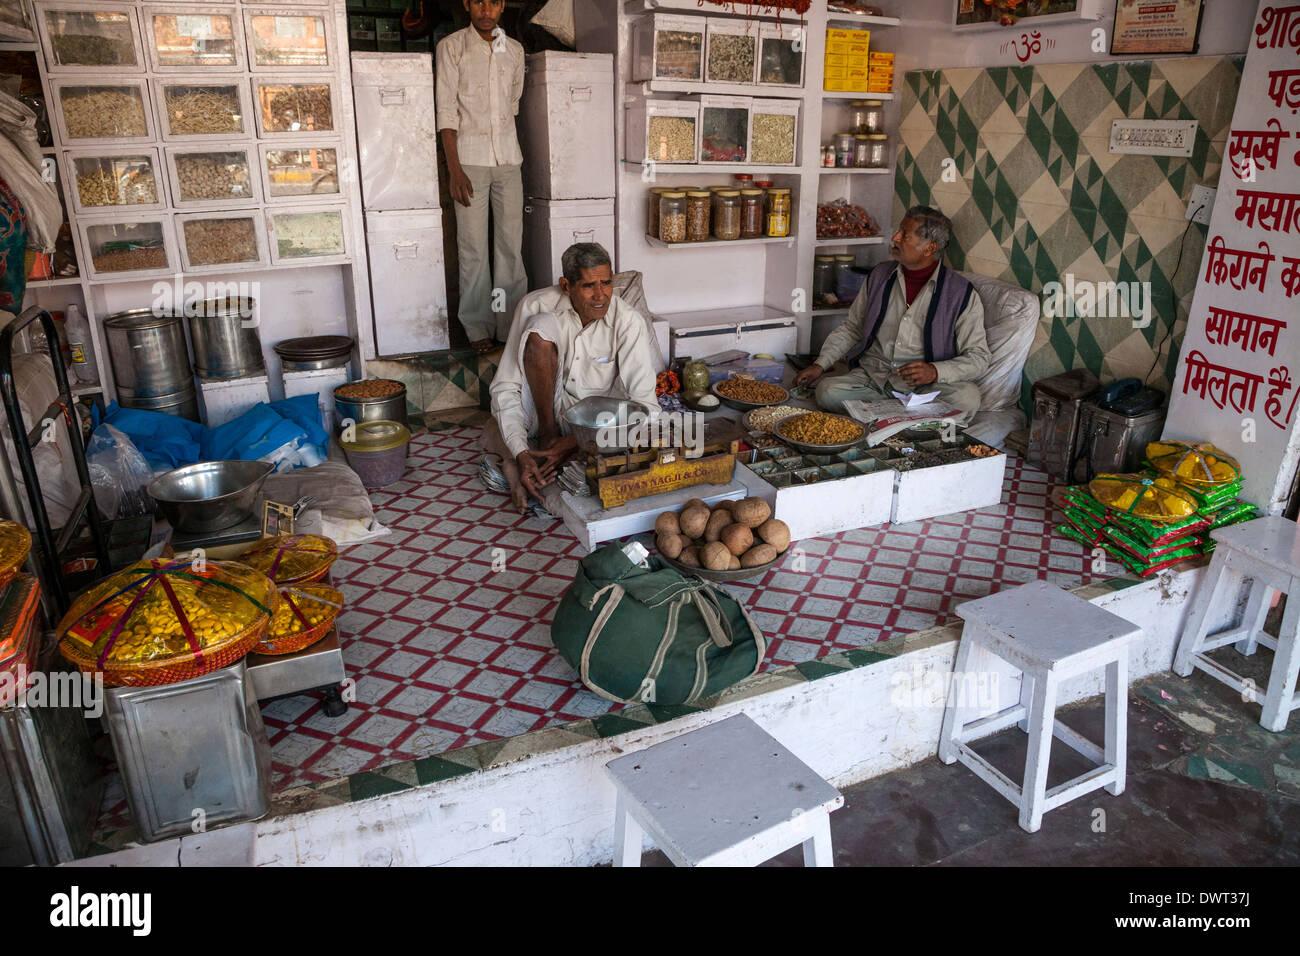 Jaipur, Rajasthan, India. Negozio di vendita di noci e frutta secca. Immagini Stock